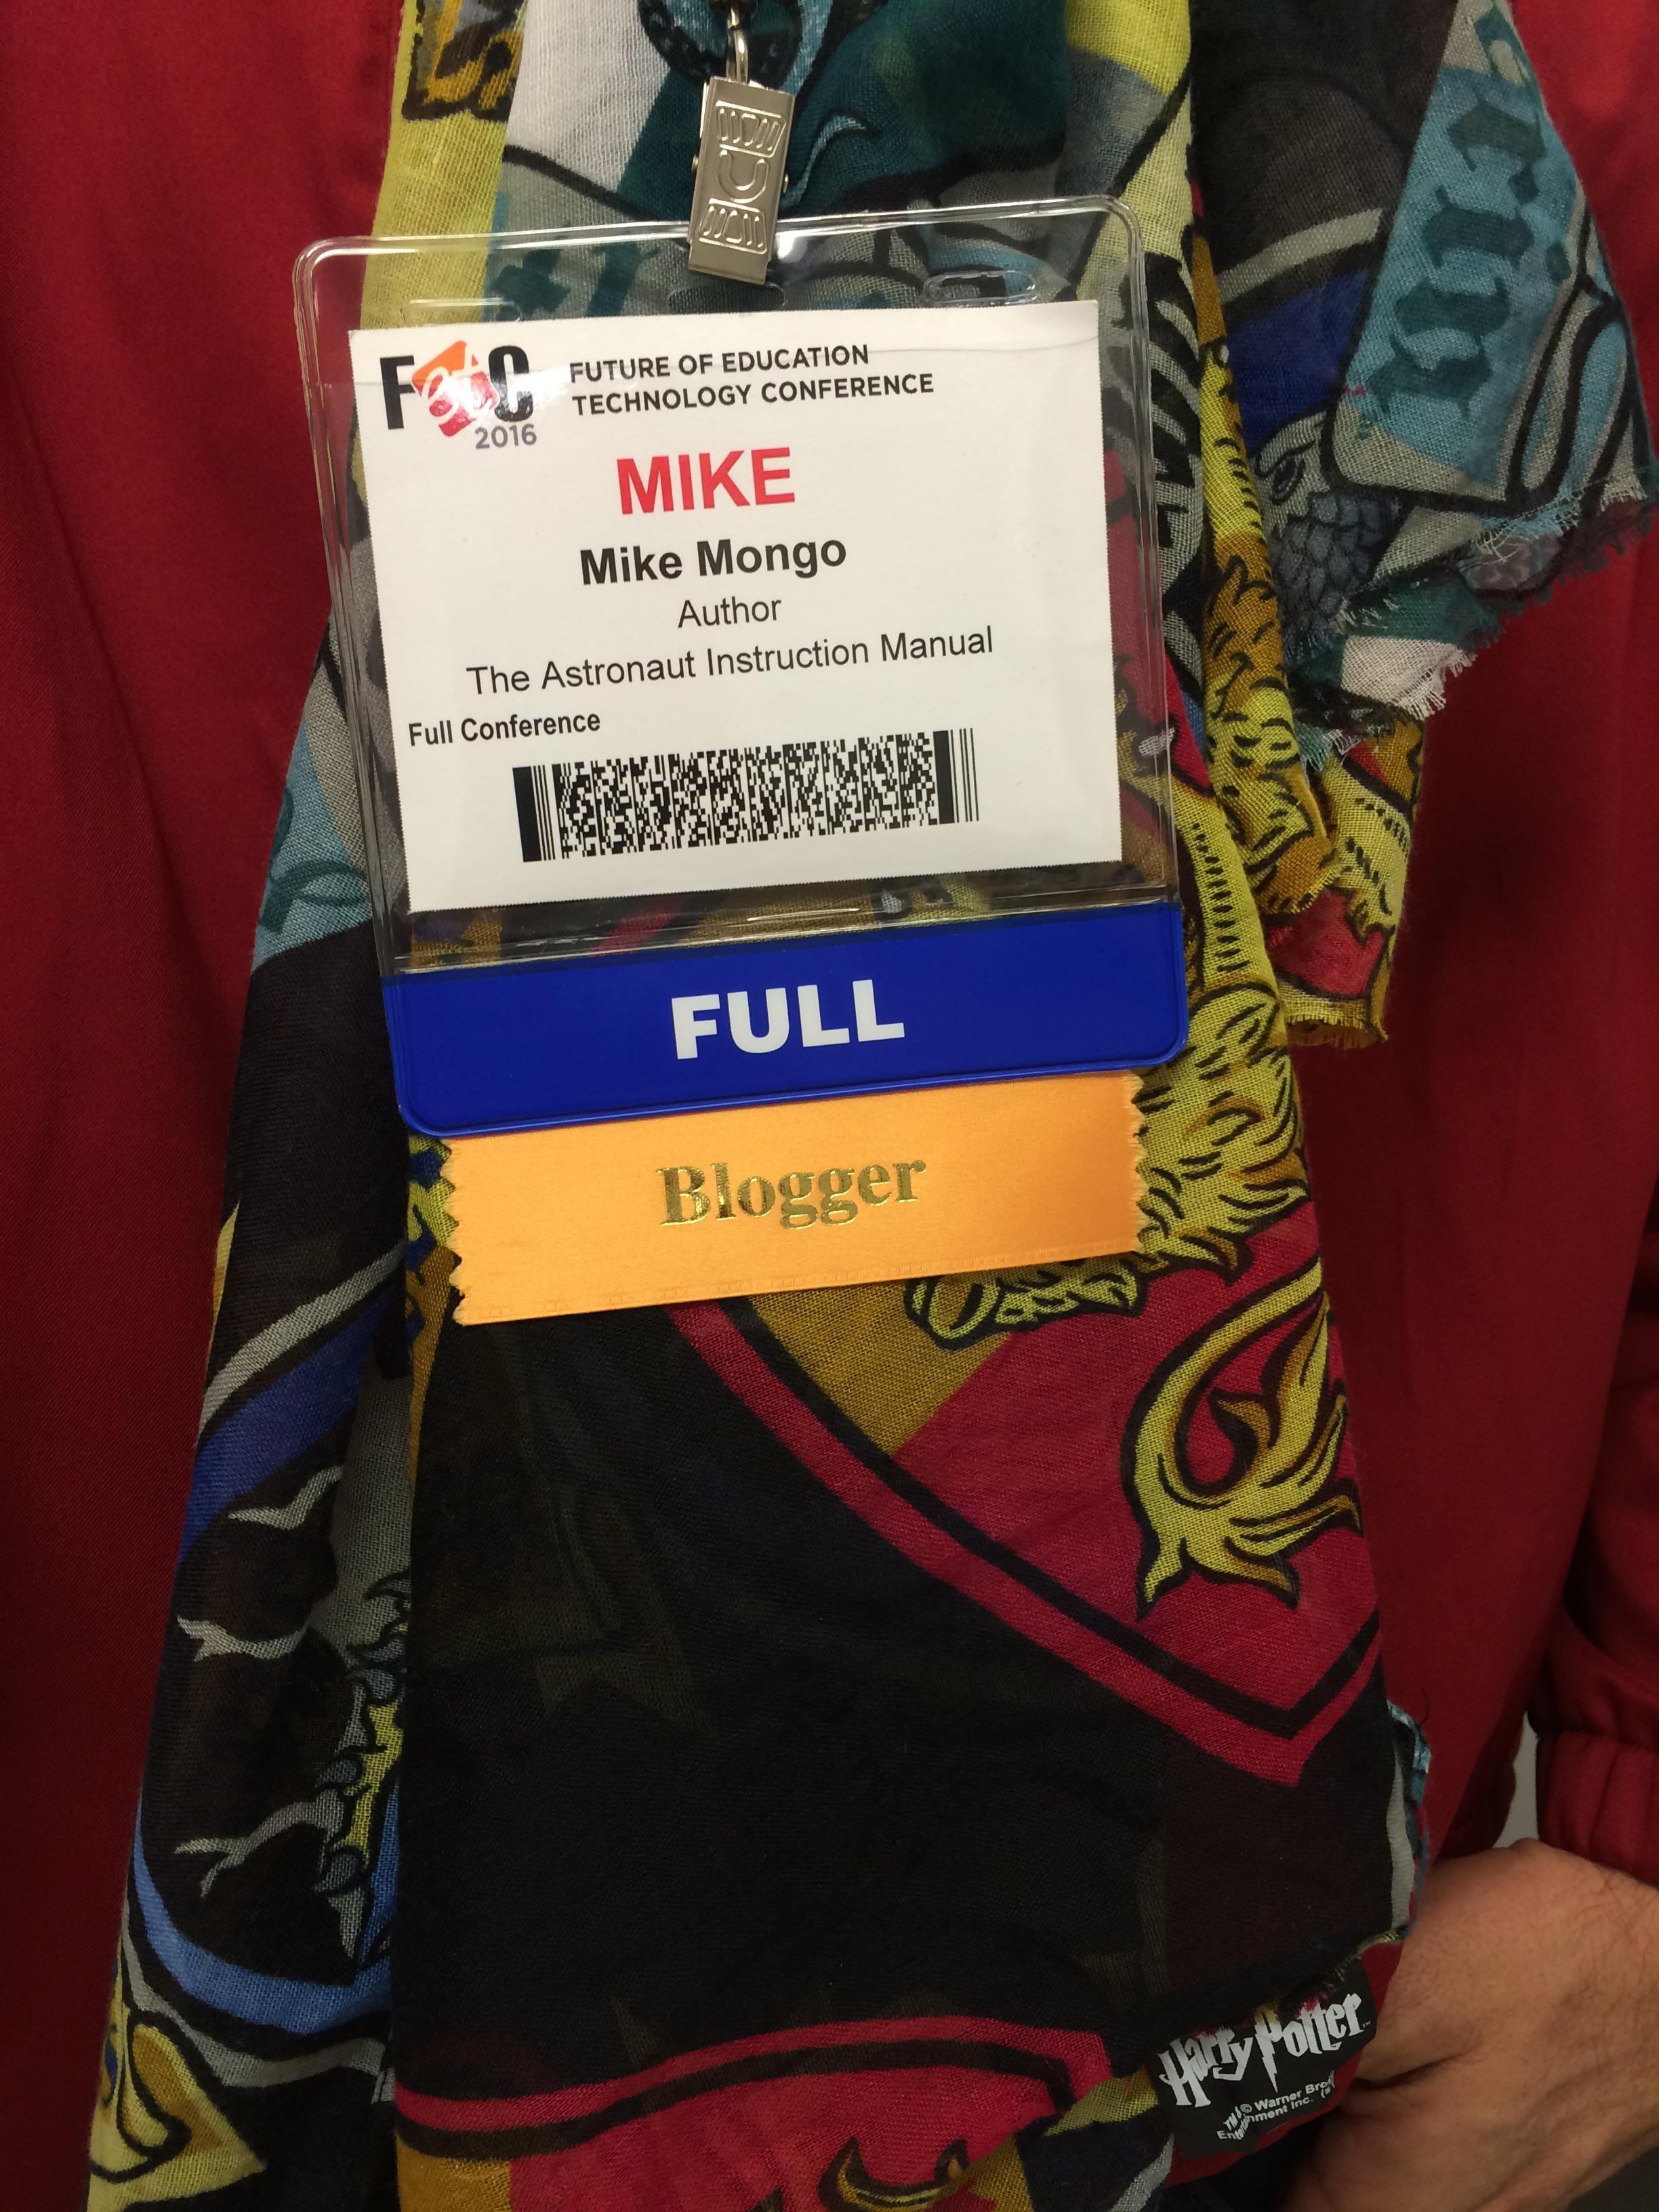 FETC badge